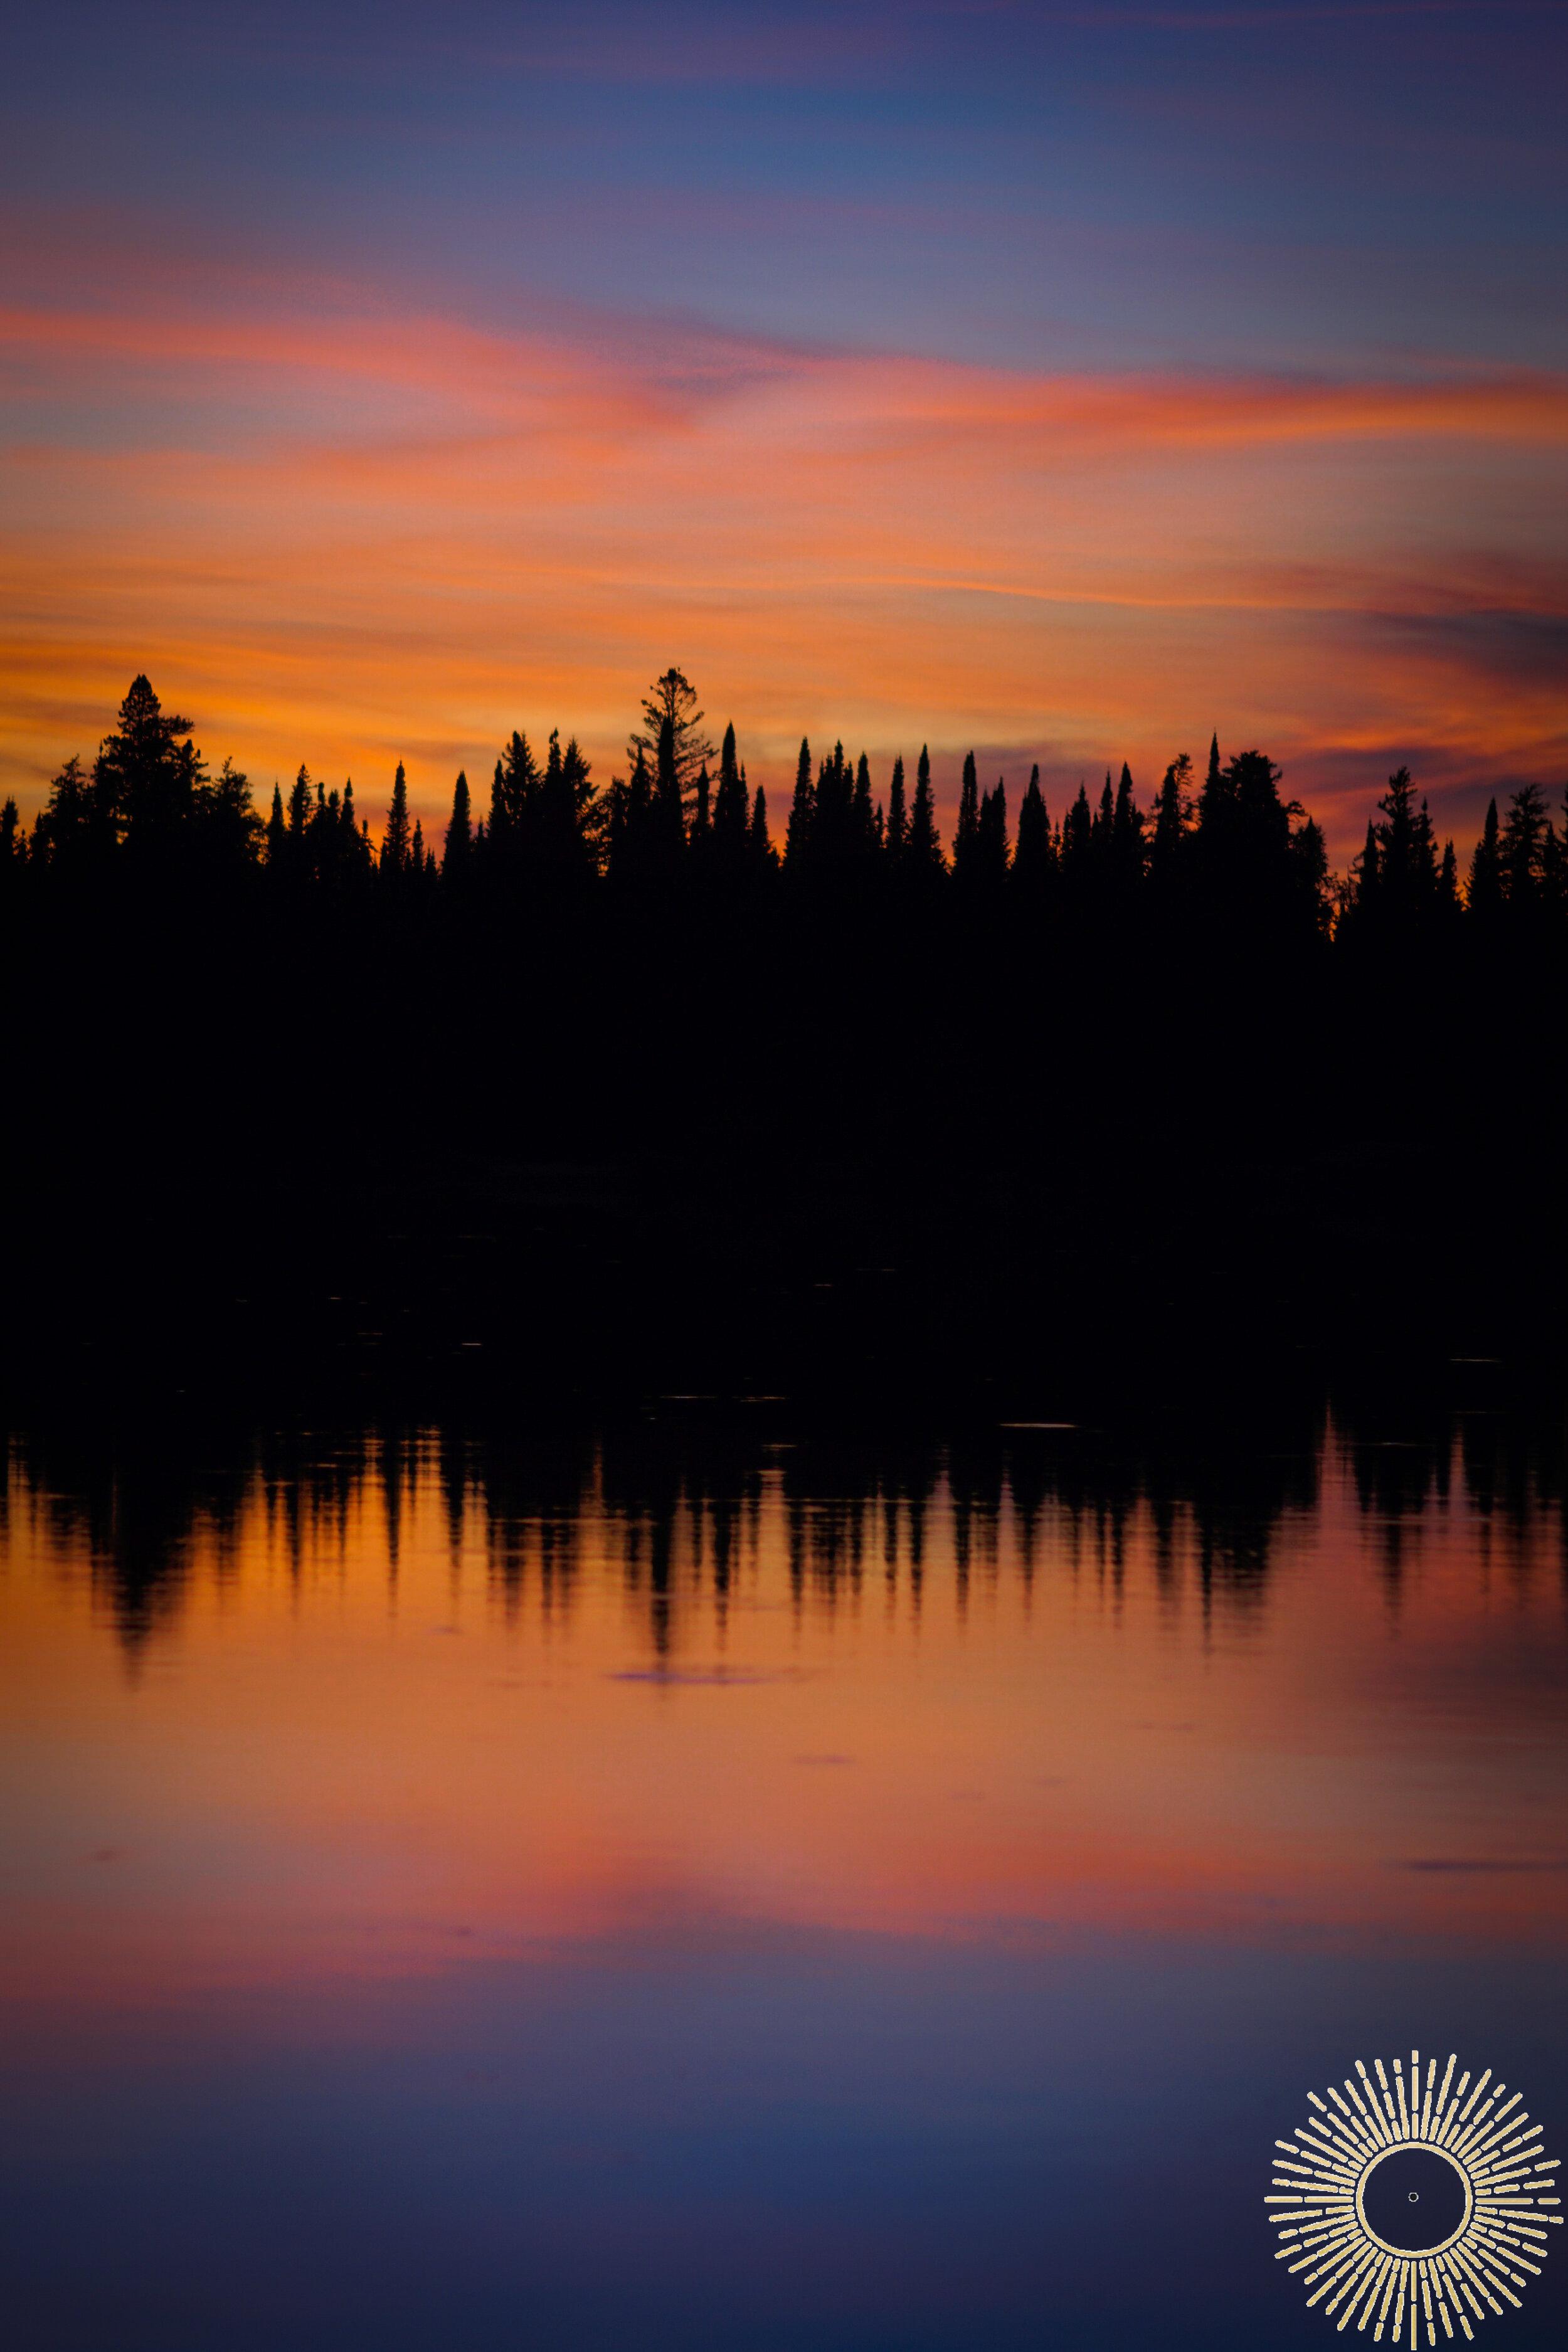 Blind Spot Creatives - Kawishiwi Lake - Boundary Waters Canoe Area & Wilderness - Alyssa Johnson - Duluth, Minnesota Photography - Copyright